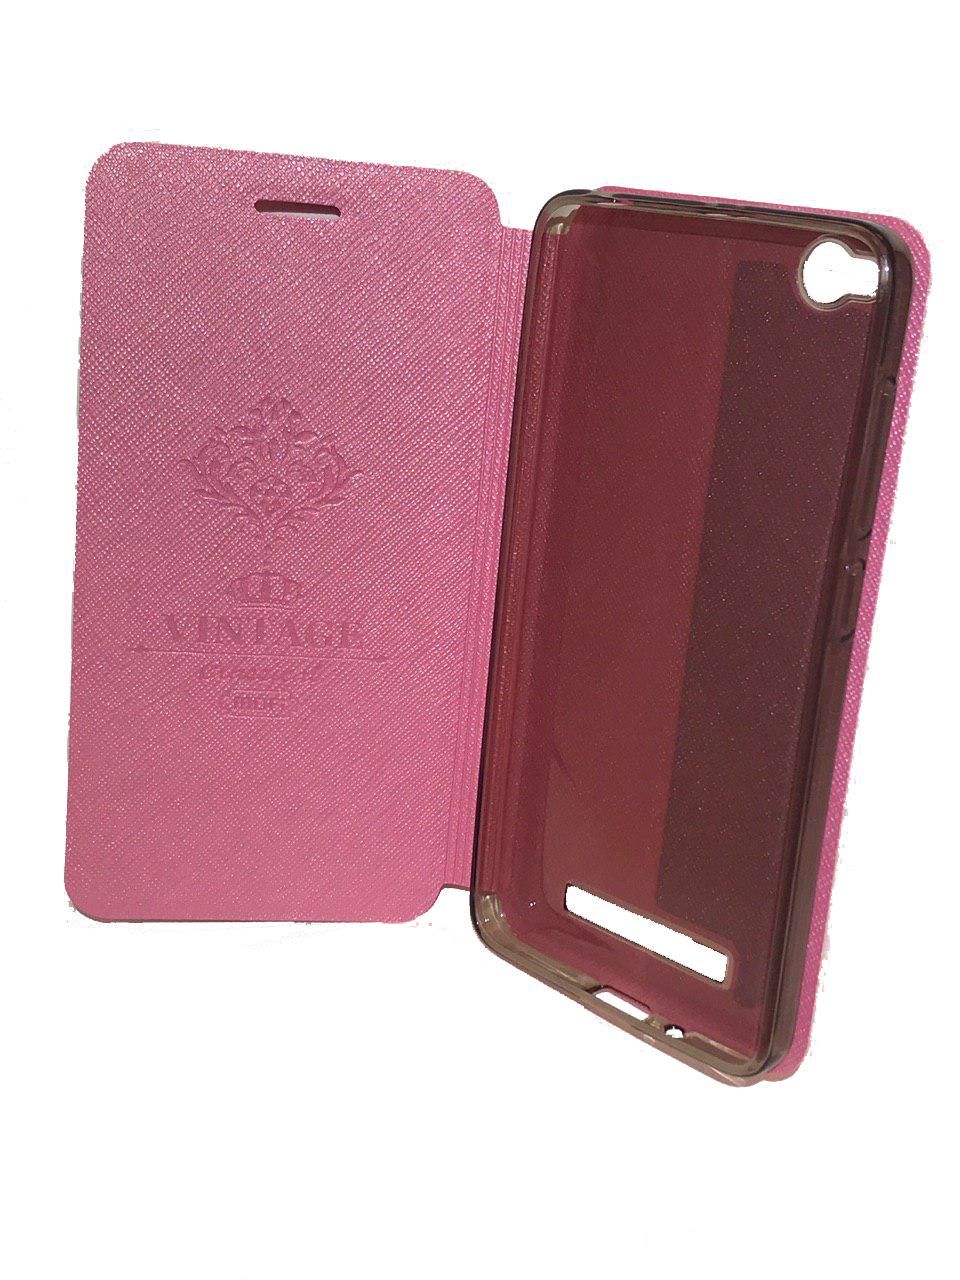 Фото - Чехол для сотового телефона Mofi Книжка Ribbed Xiaomi Redmi Note 4X Pink, розовый open shoulder ribbed tshirt